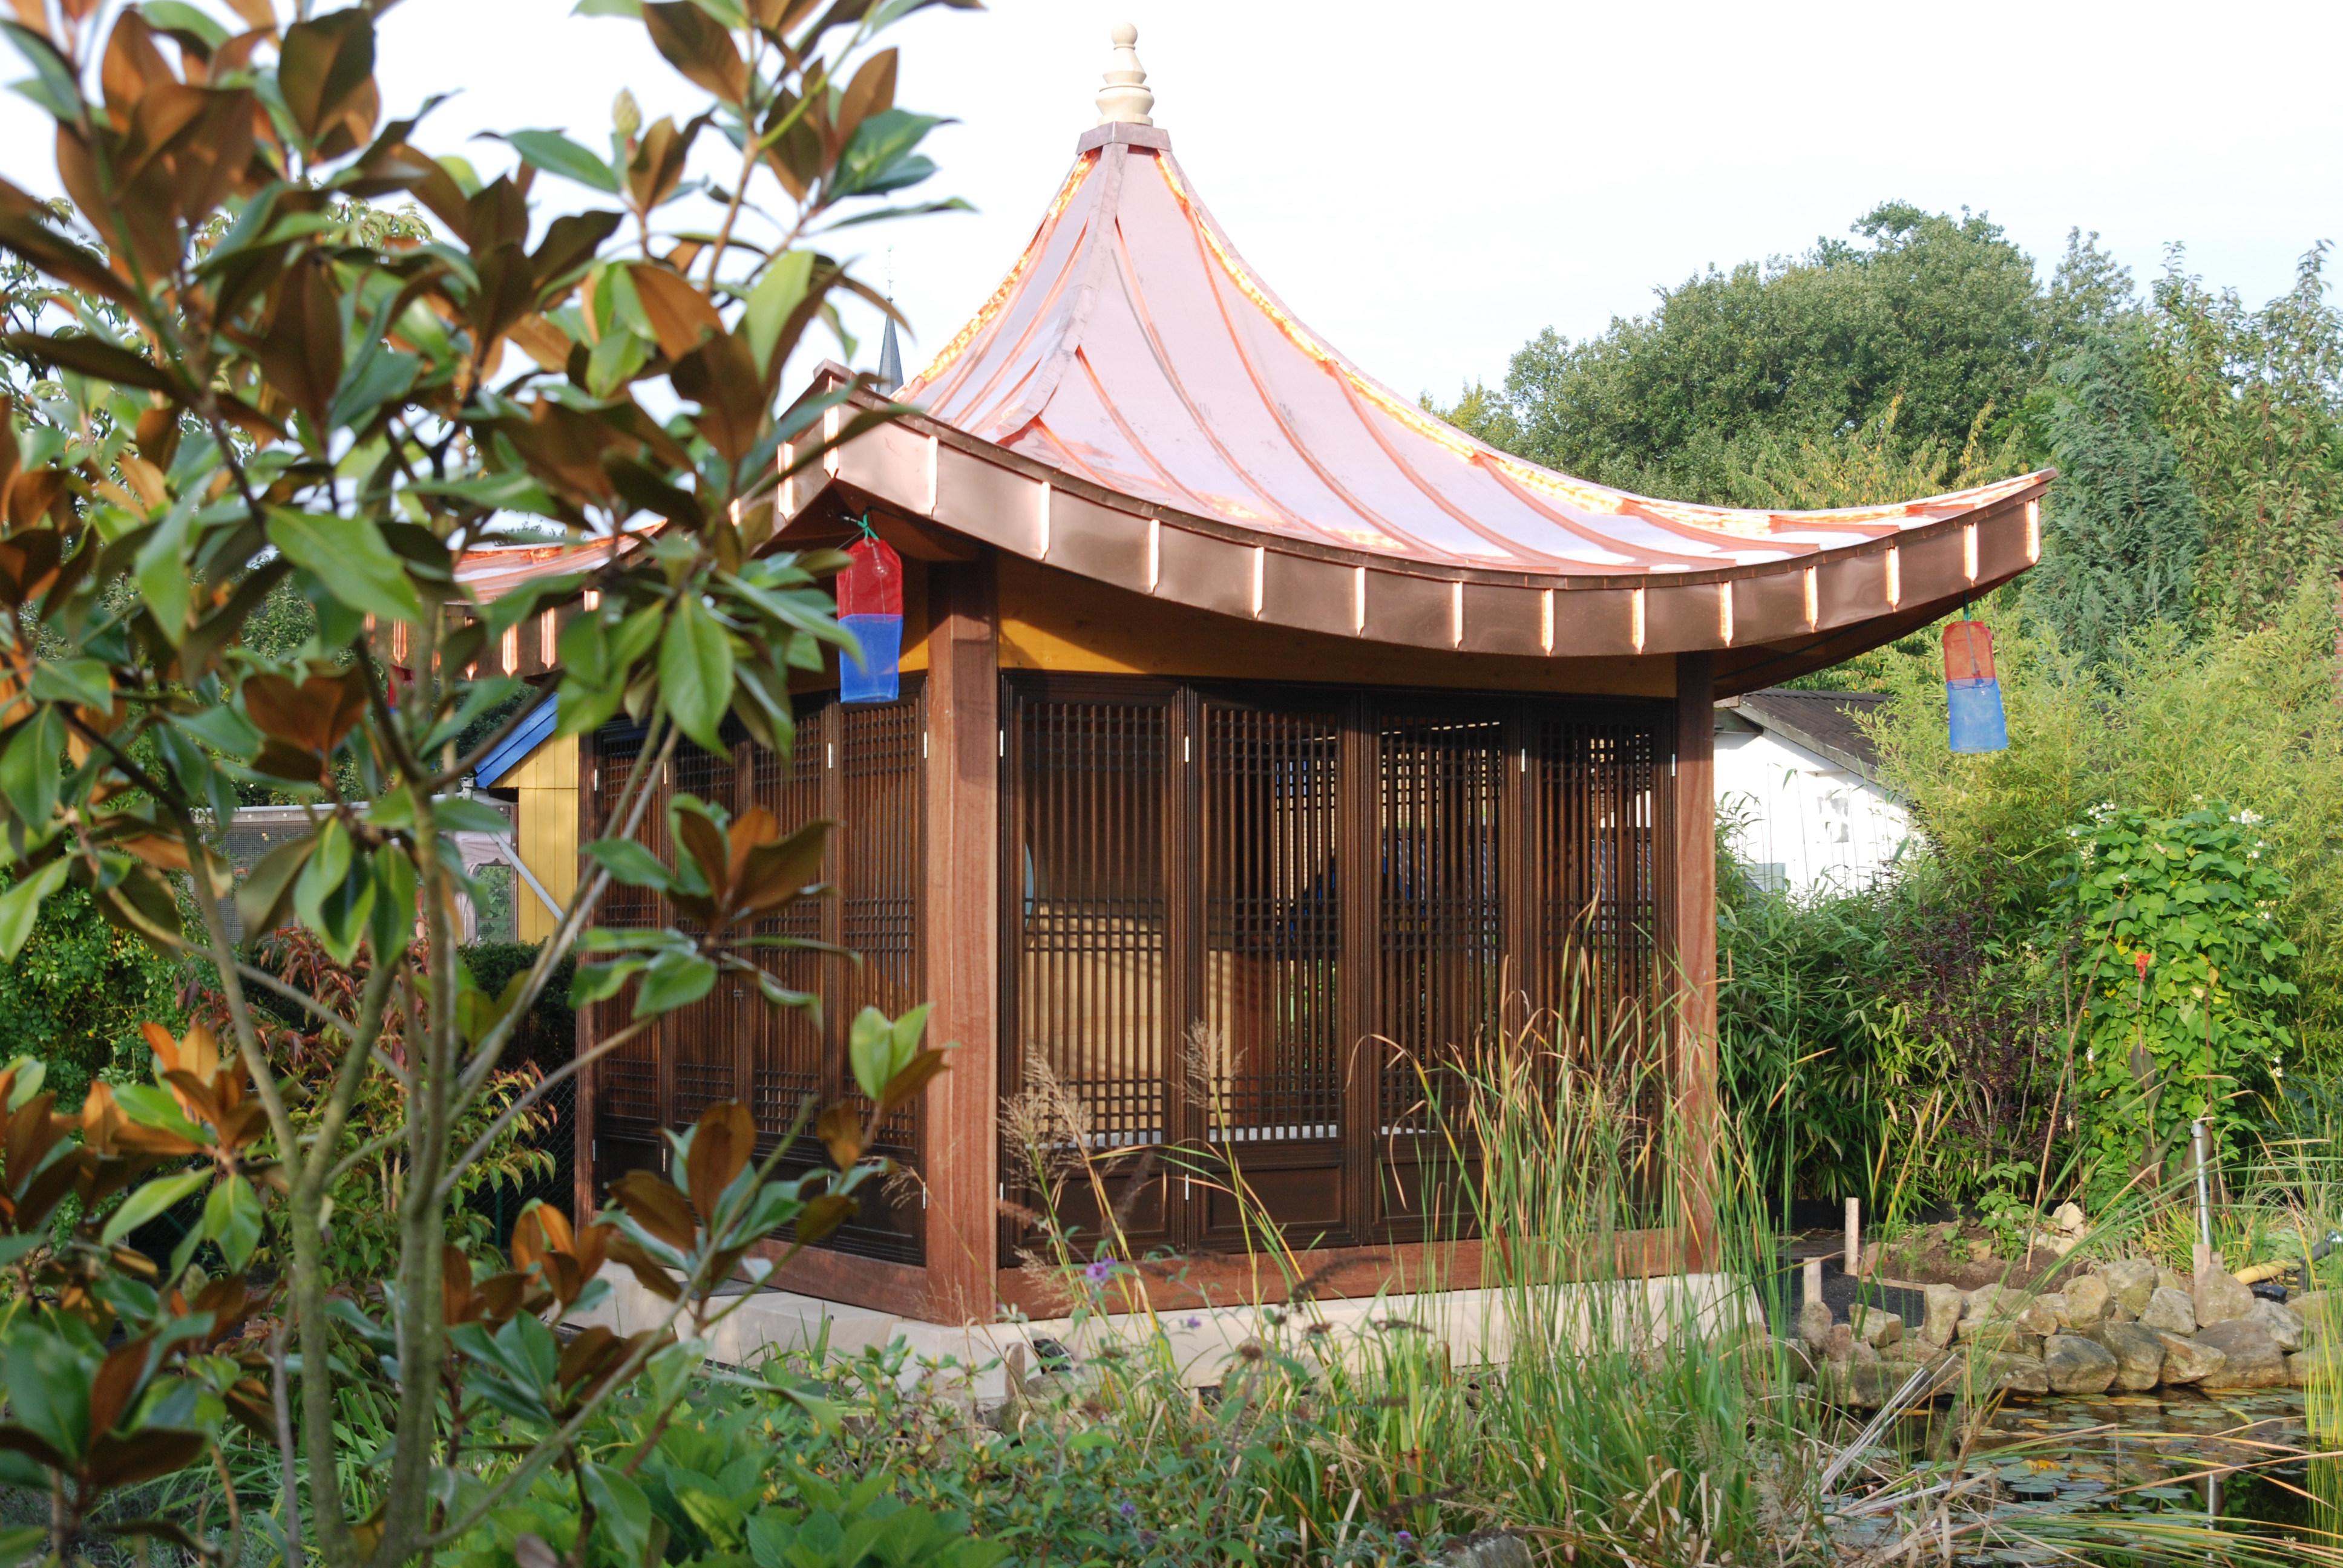 gartenpavillon. Black Bedroom Furniture Sets. Home Design Ideas